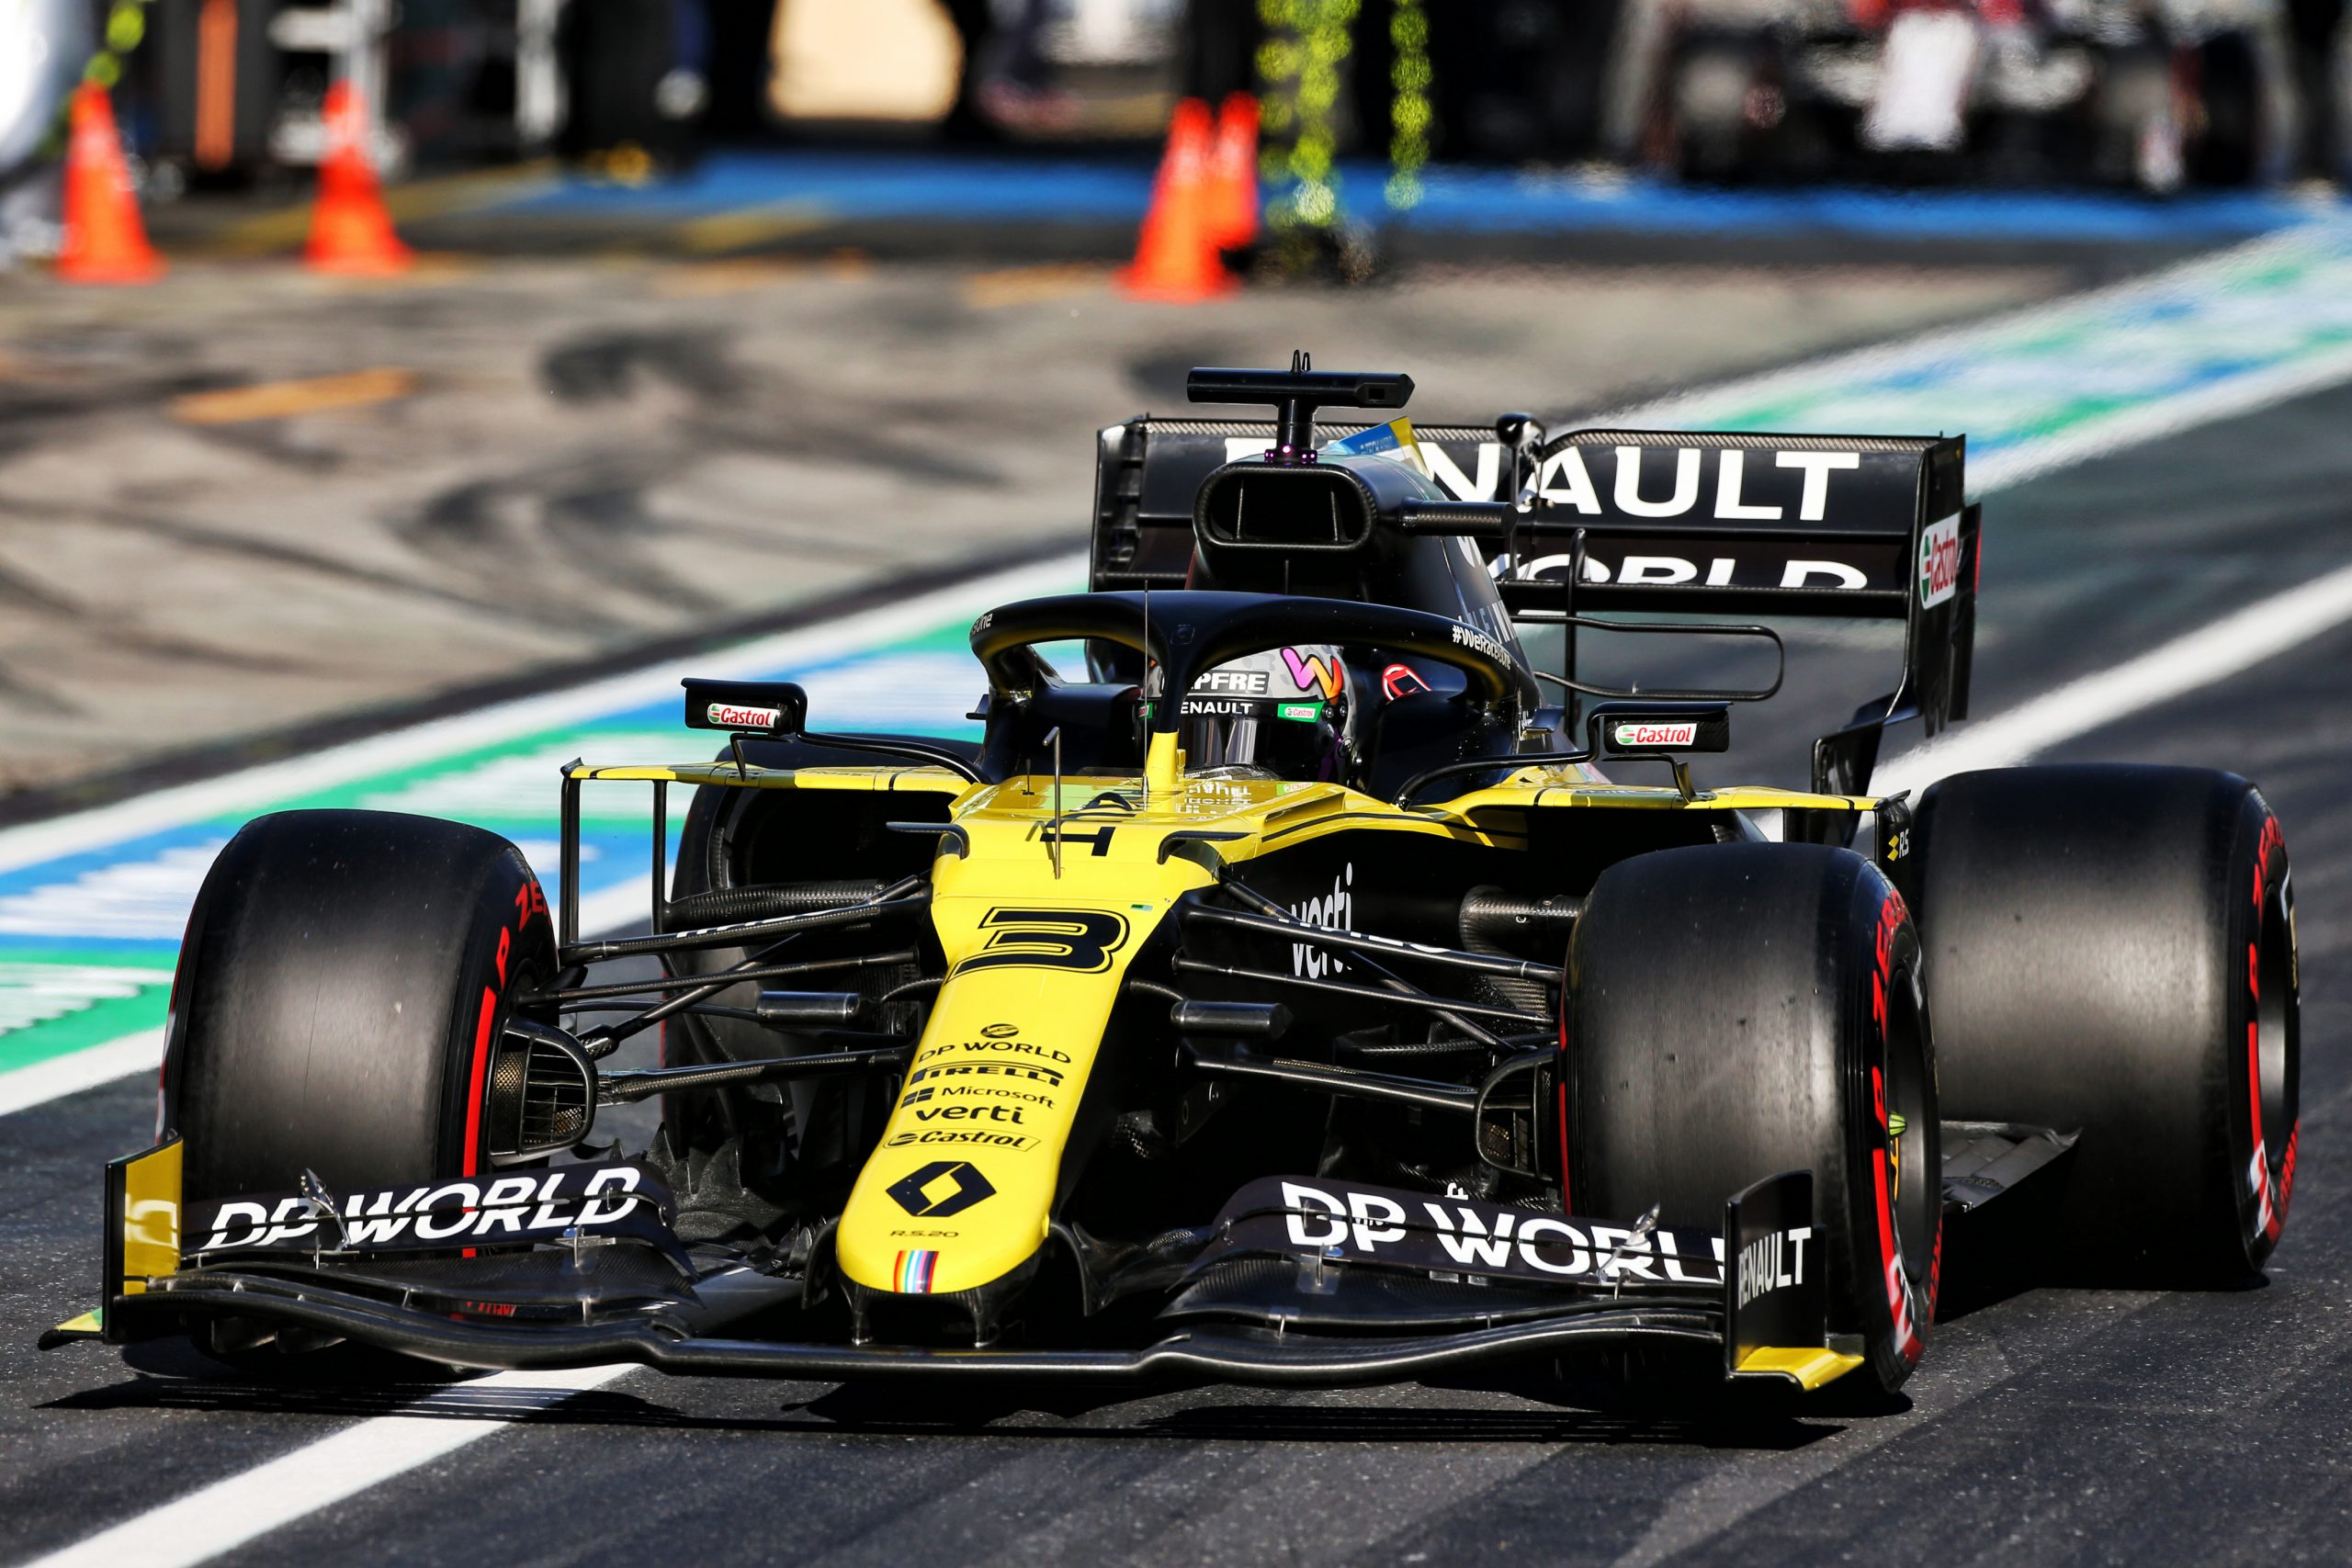 renault-f1-qualifications-nurburgring